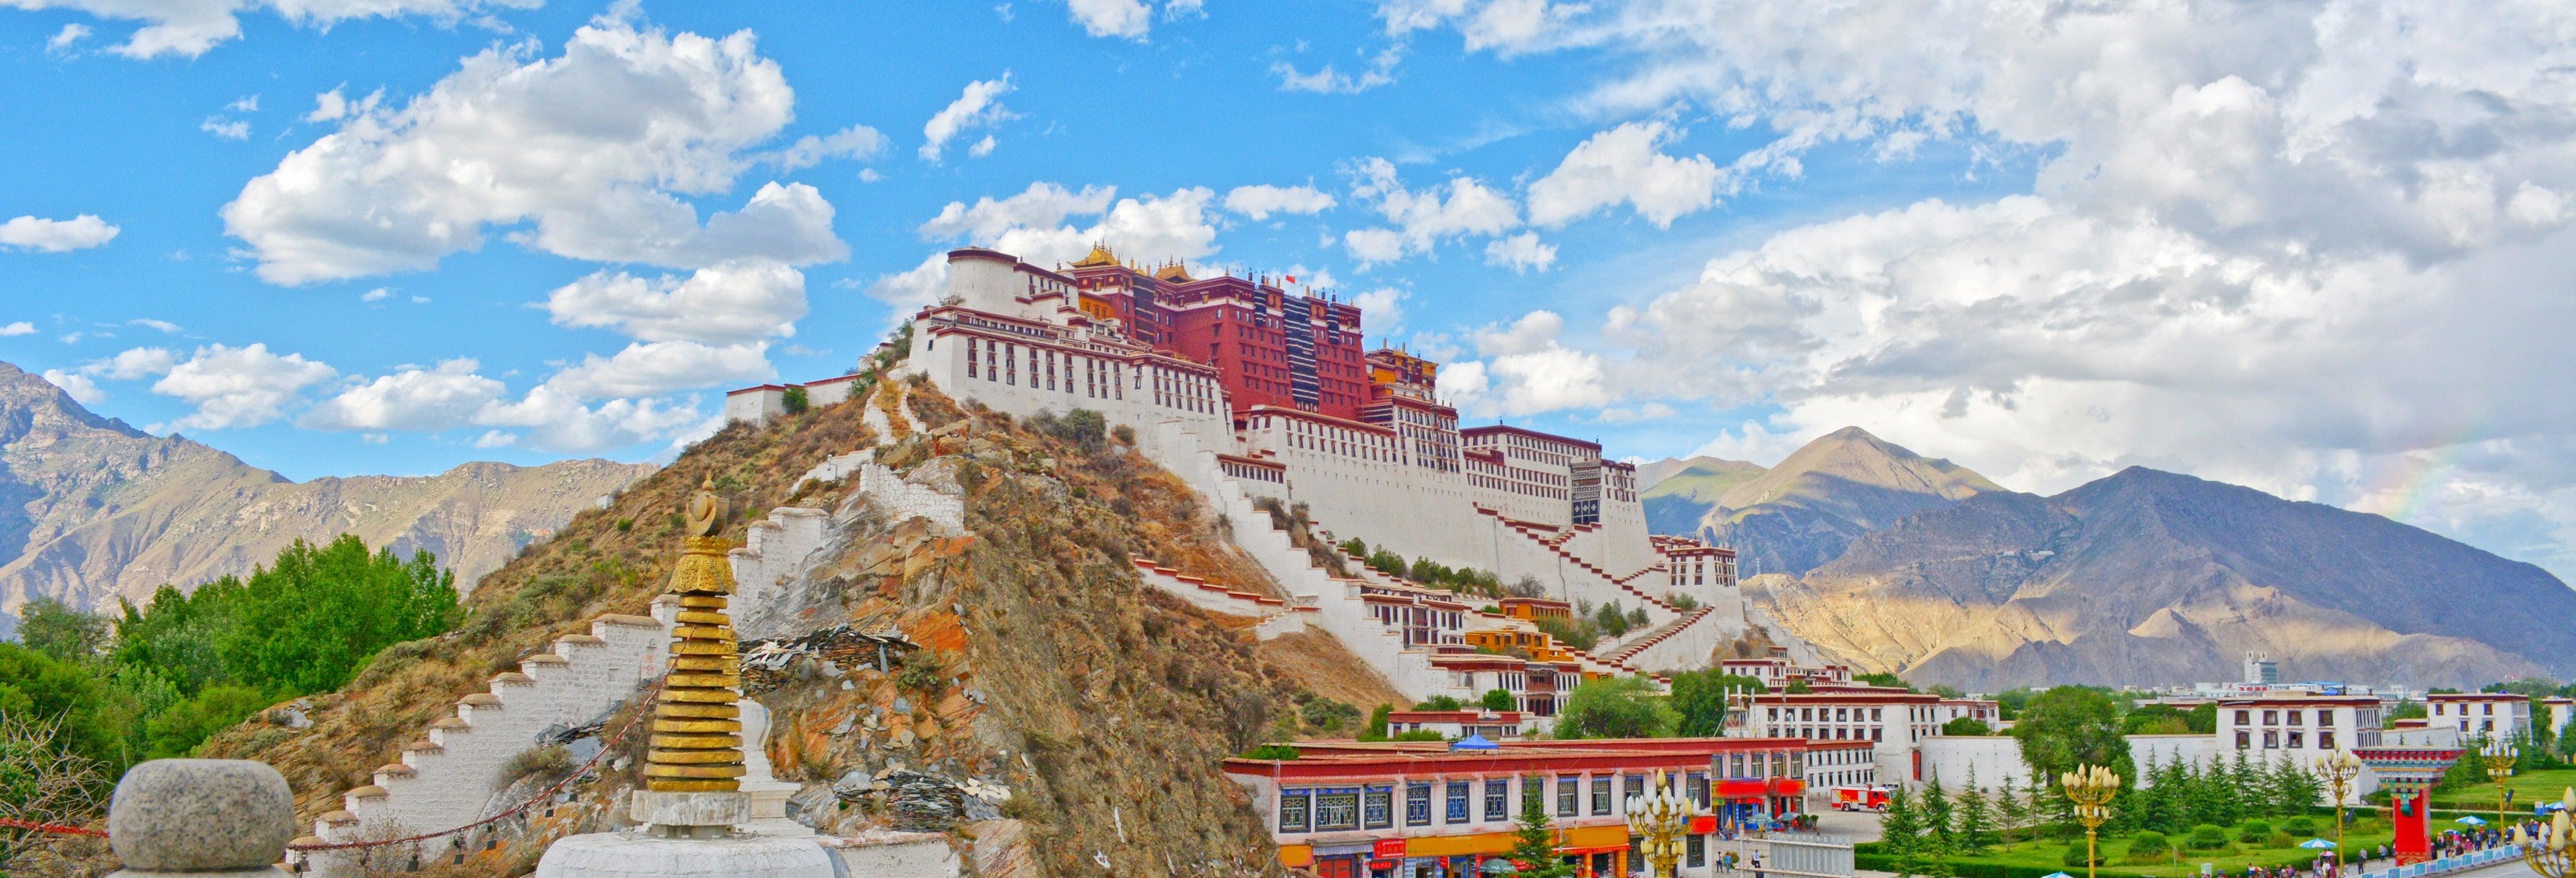 Lhasa Temples & Monasteries: 4 Day Tour